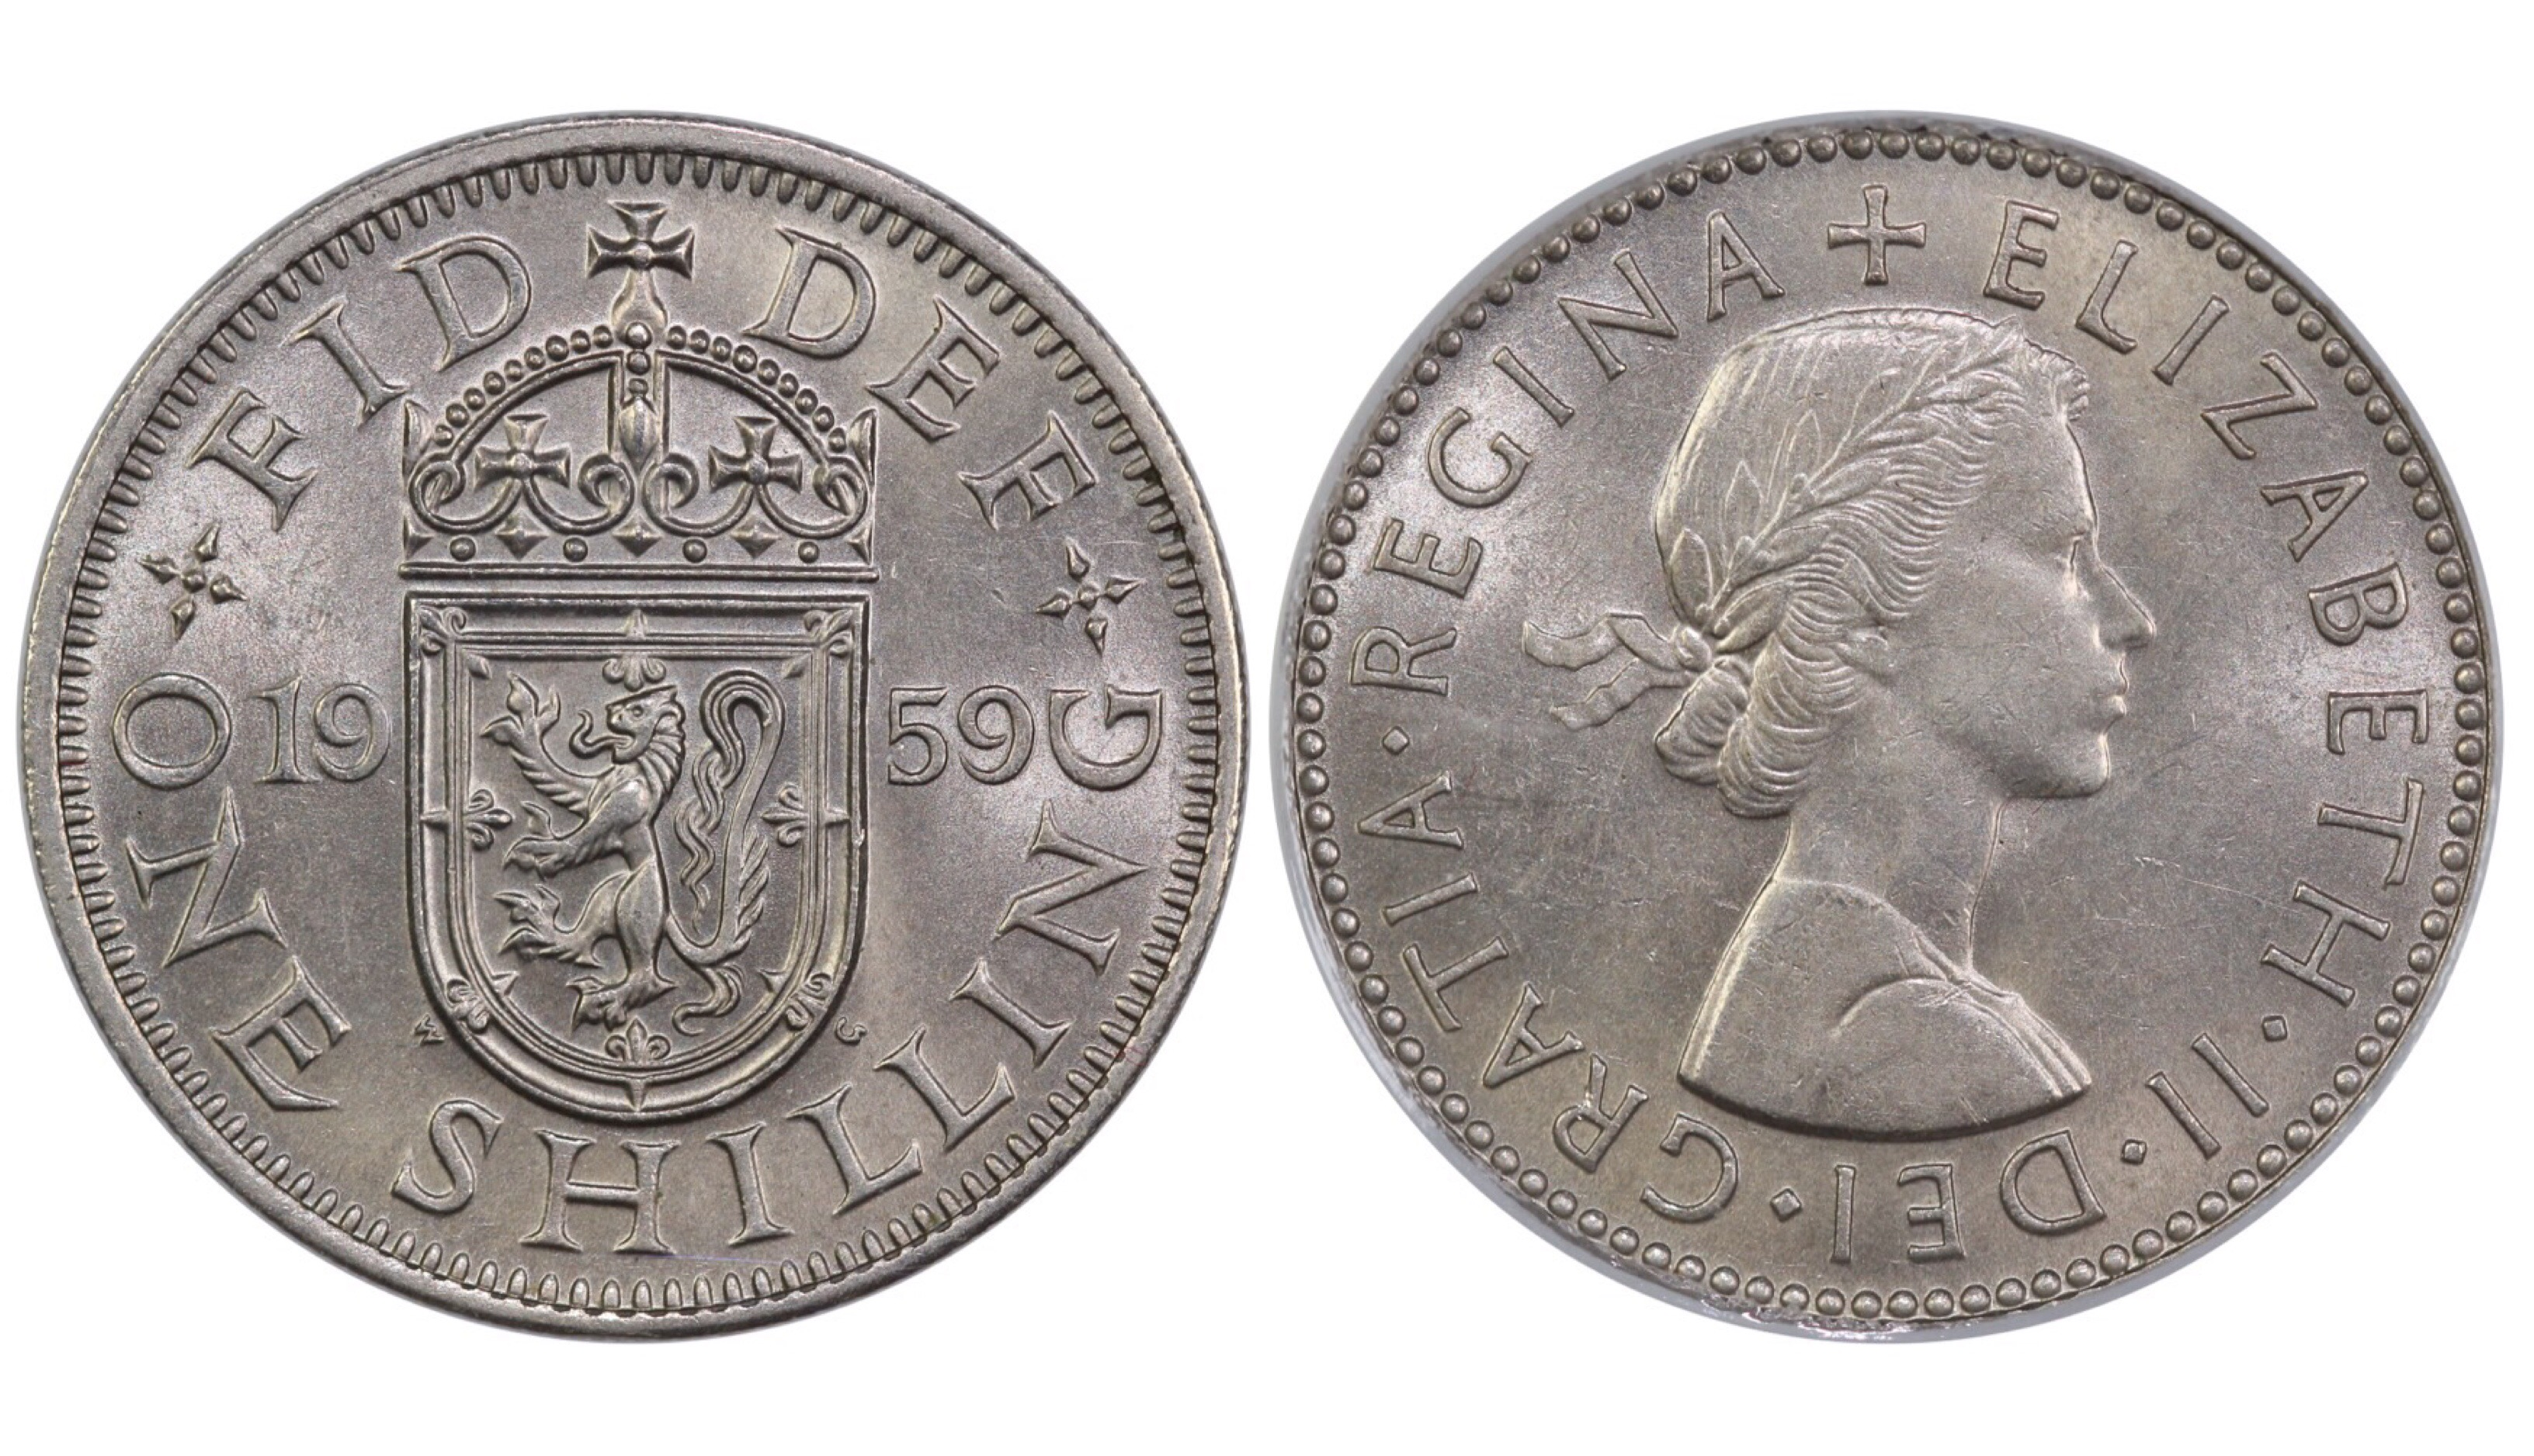 1959 'Scottish' Shilling, CGS 65, Elizabeth II, ESC 1475Z, UIN 38835